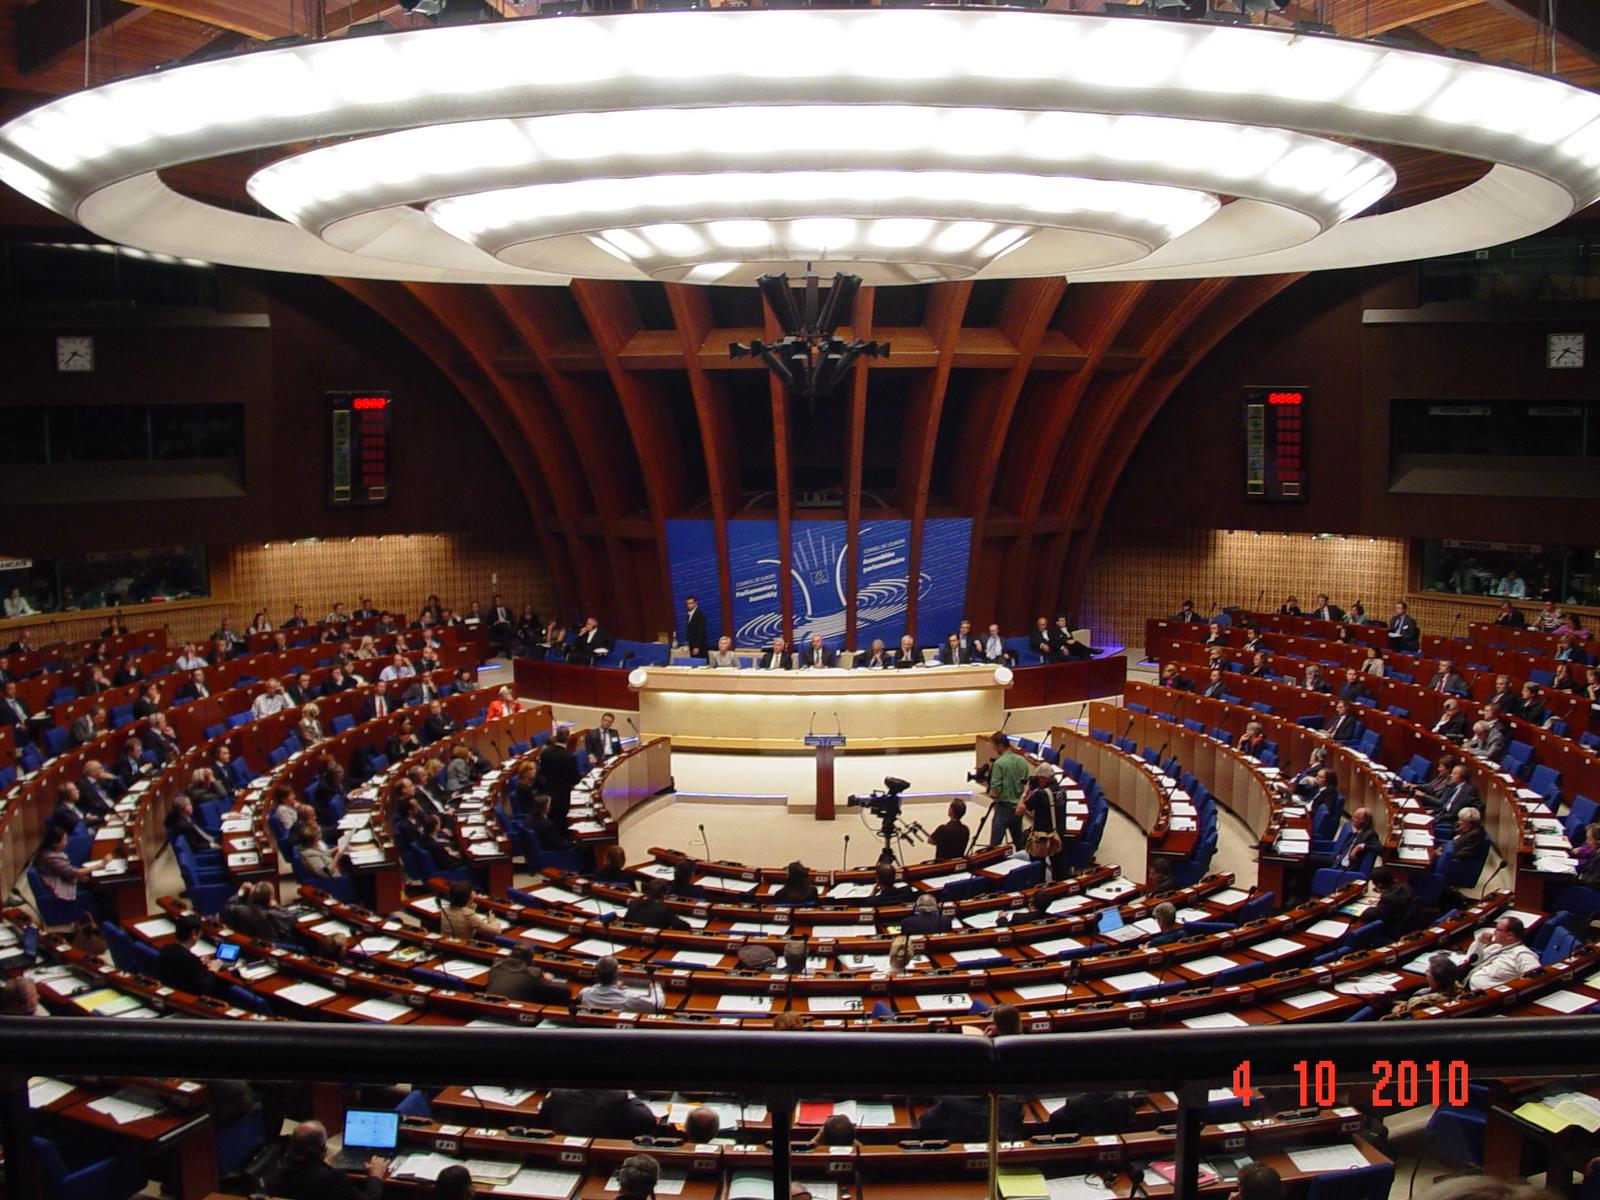 moldova-parlamentosu-ulkelere-gore-secim-baraji